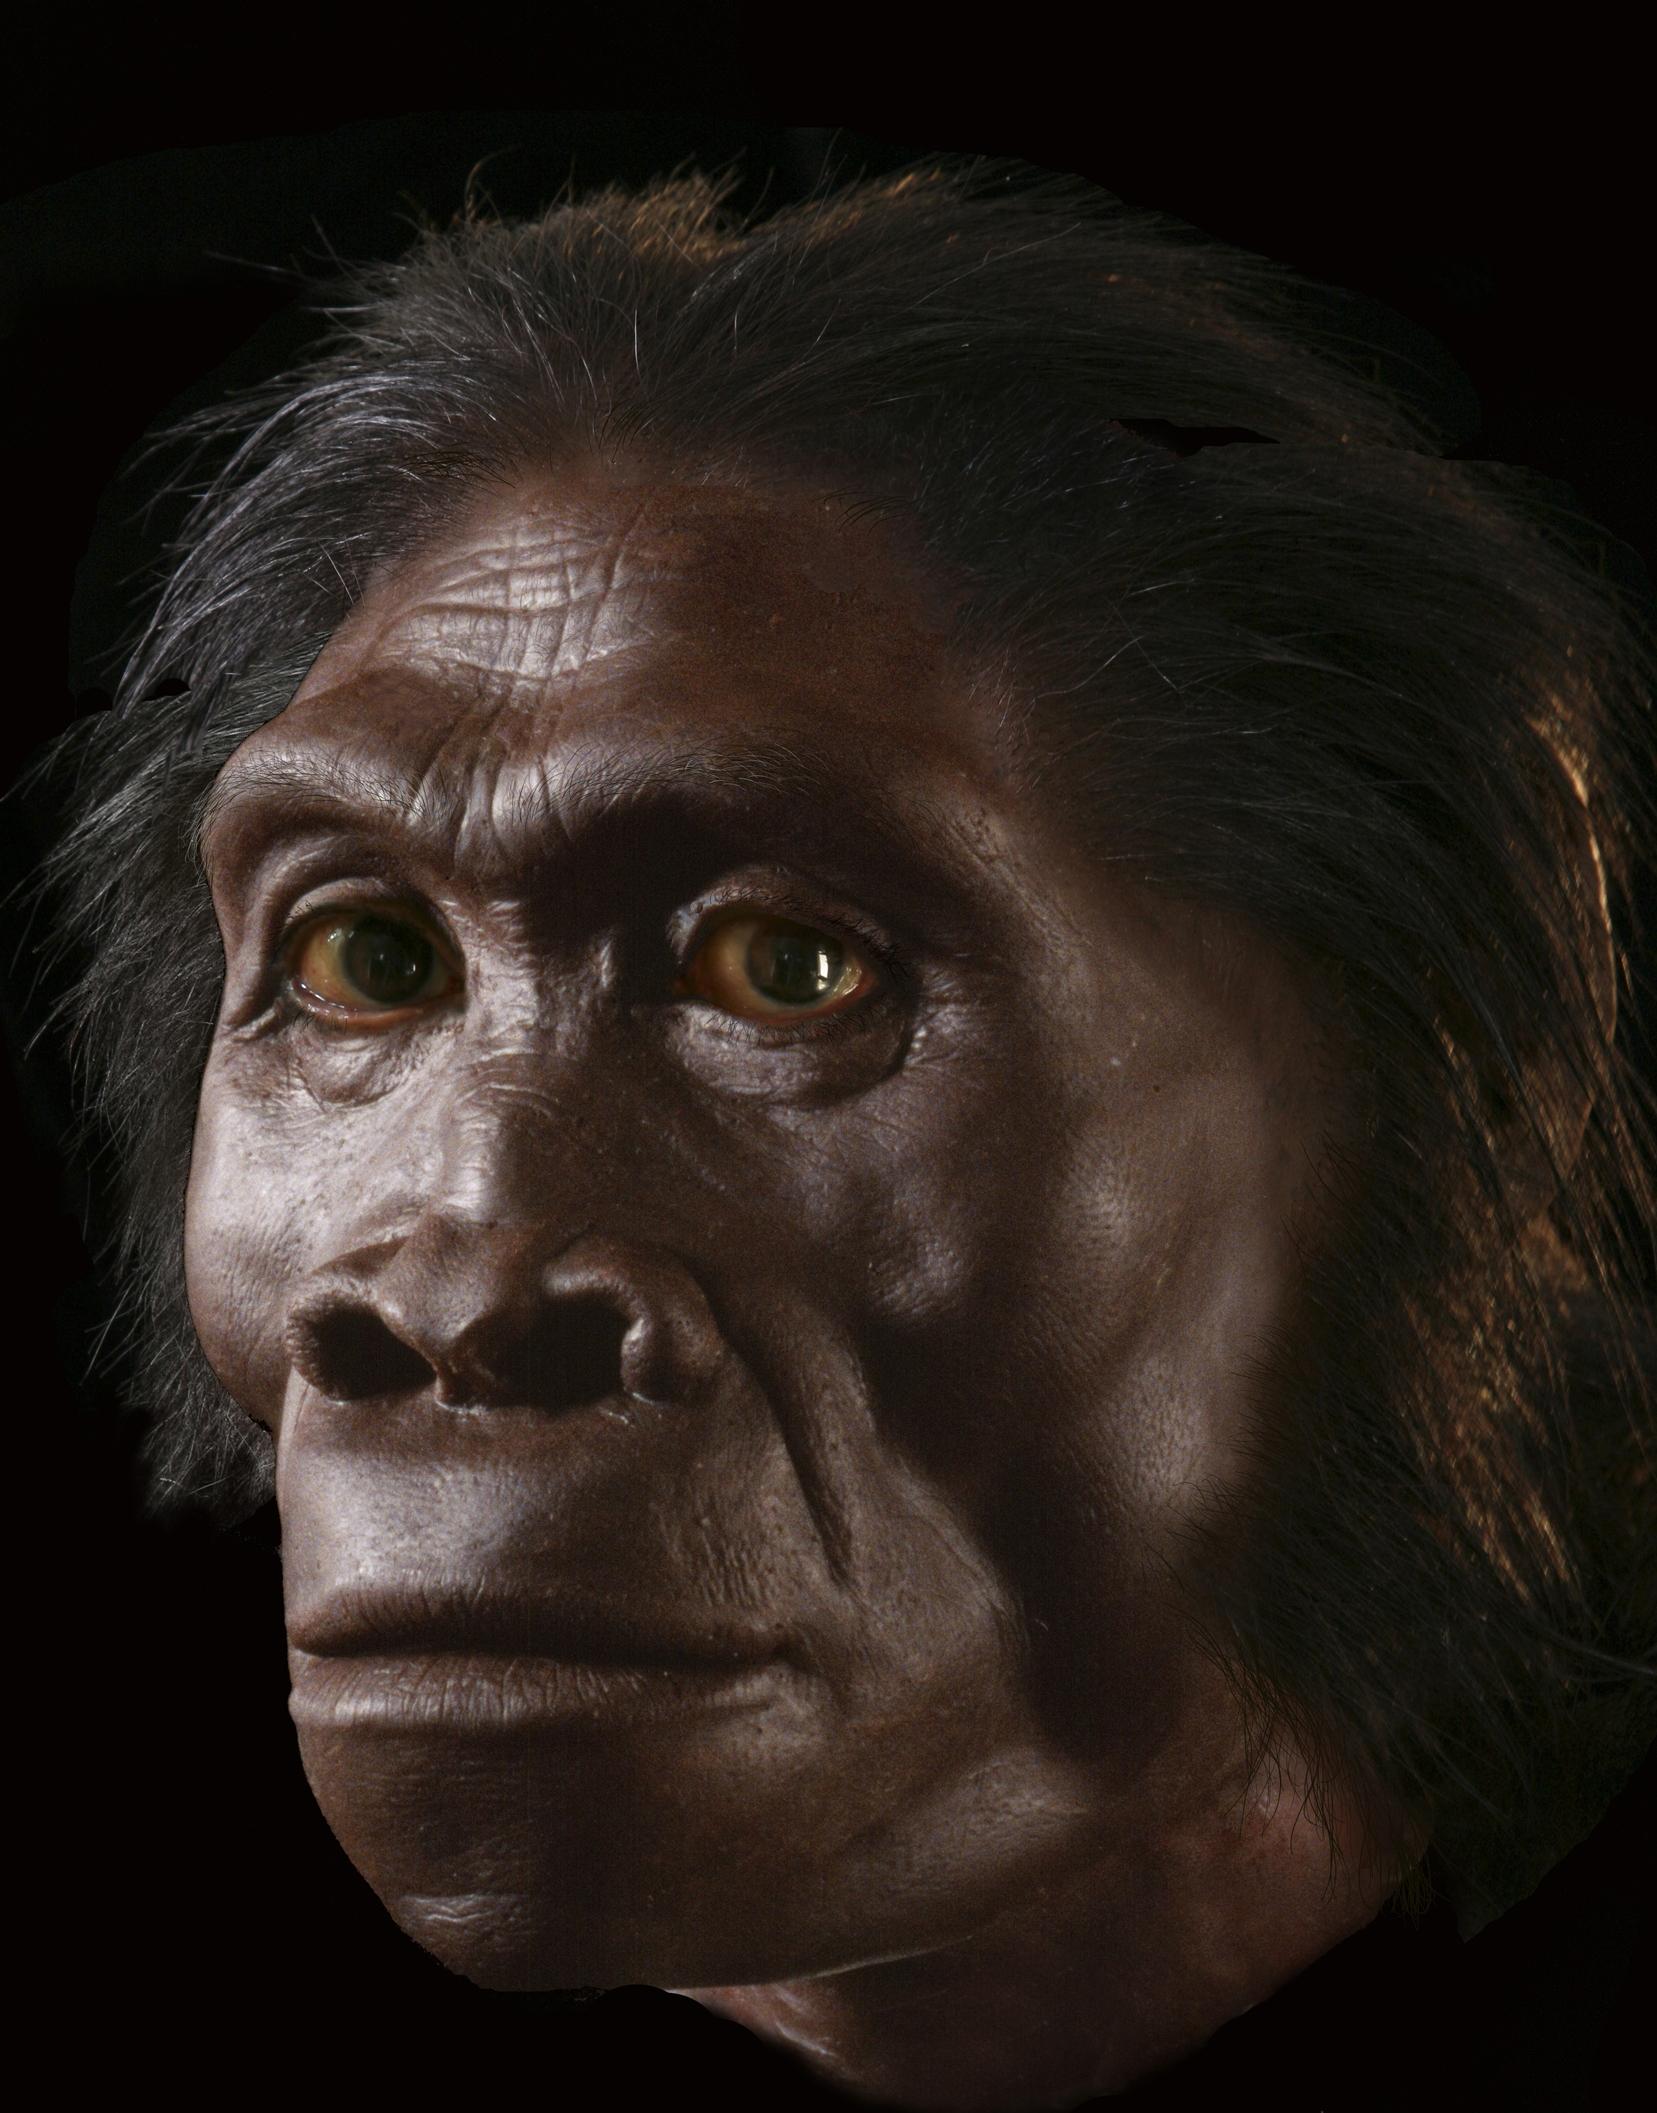 Image 774  Homo habilis based on KNM ER 1813.jpg